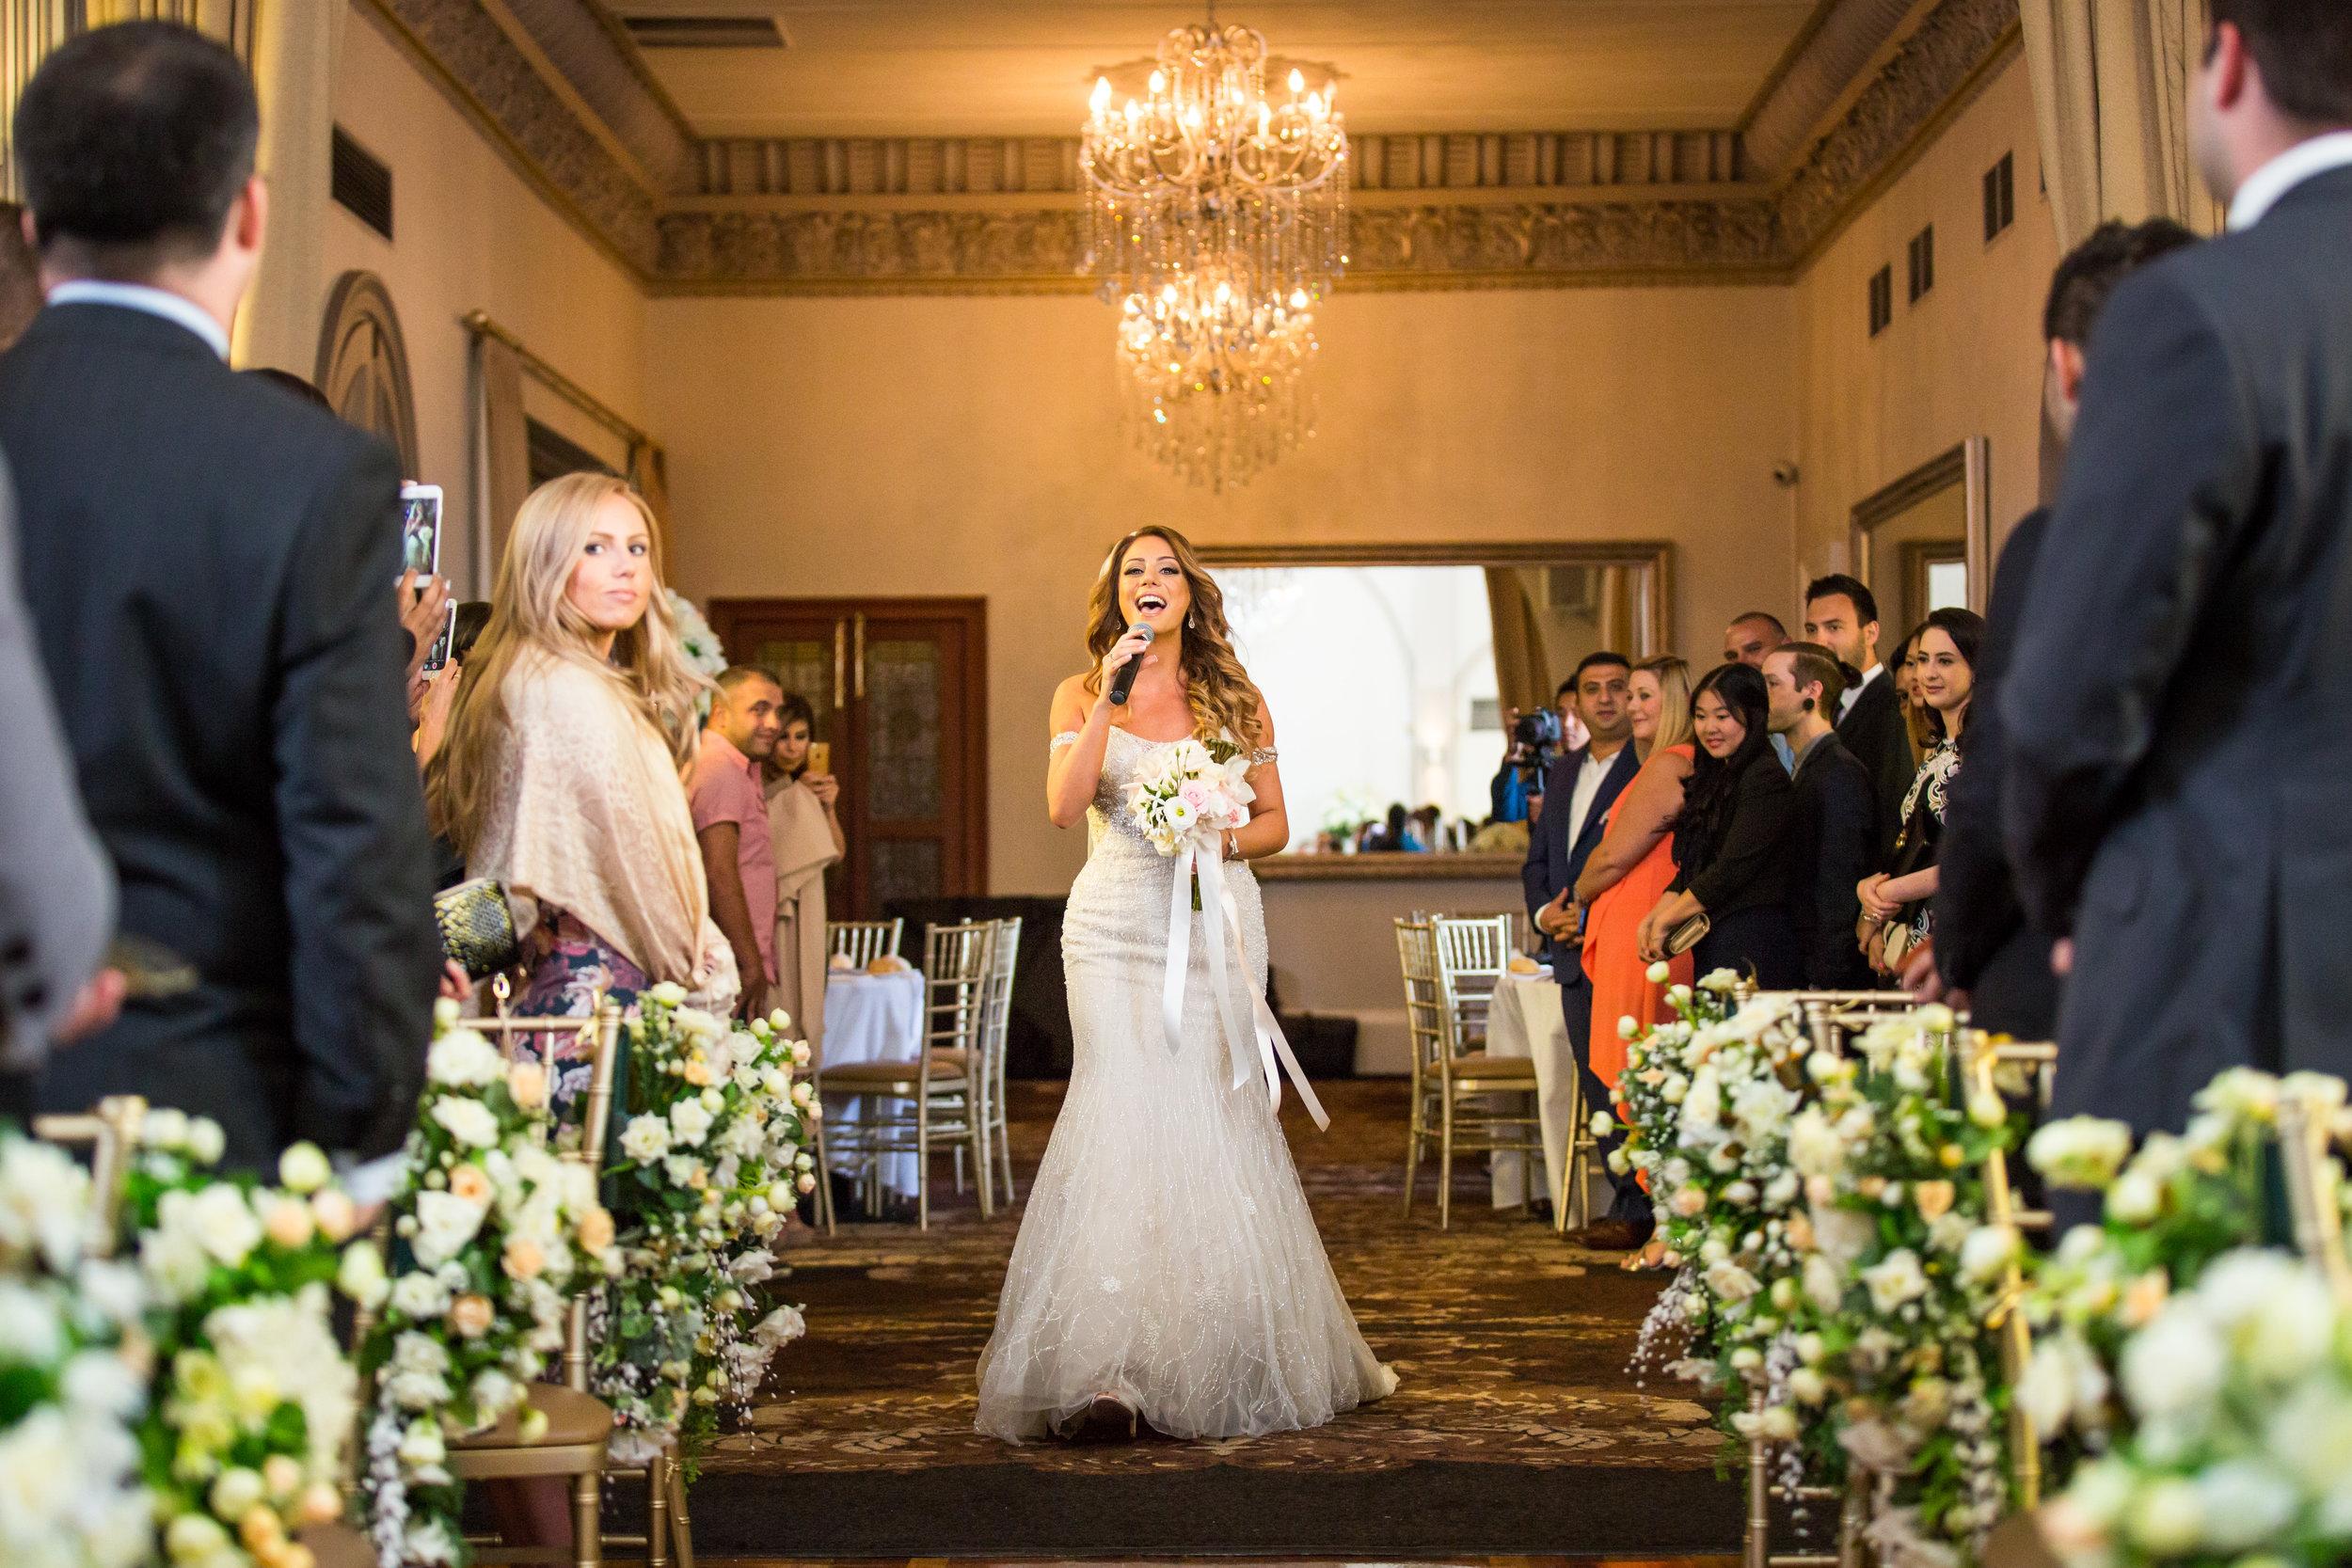 bride walking down aisle singing